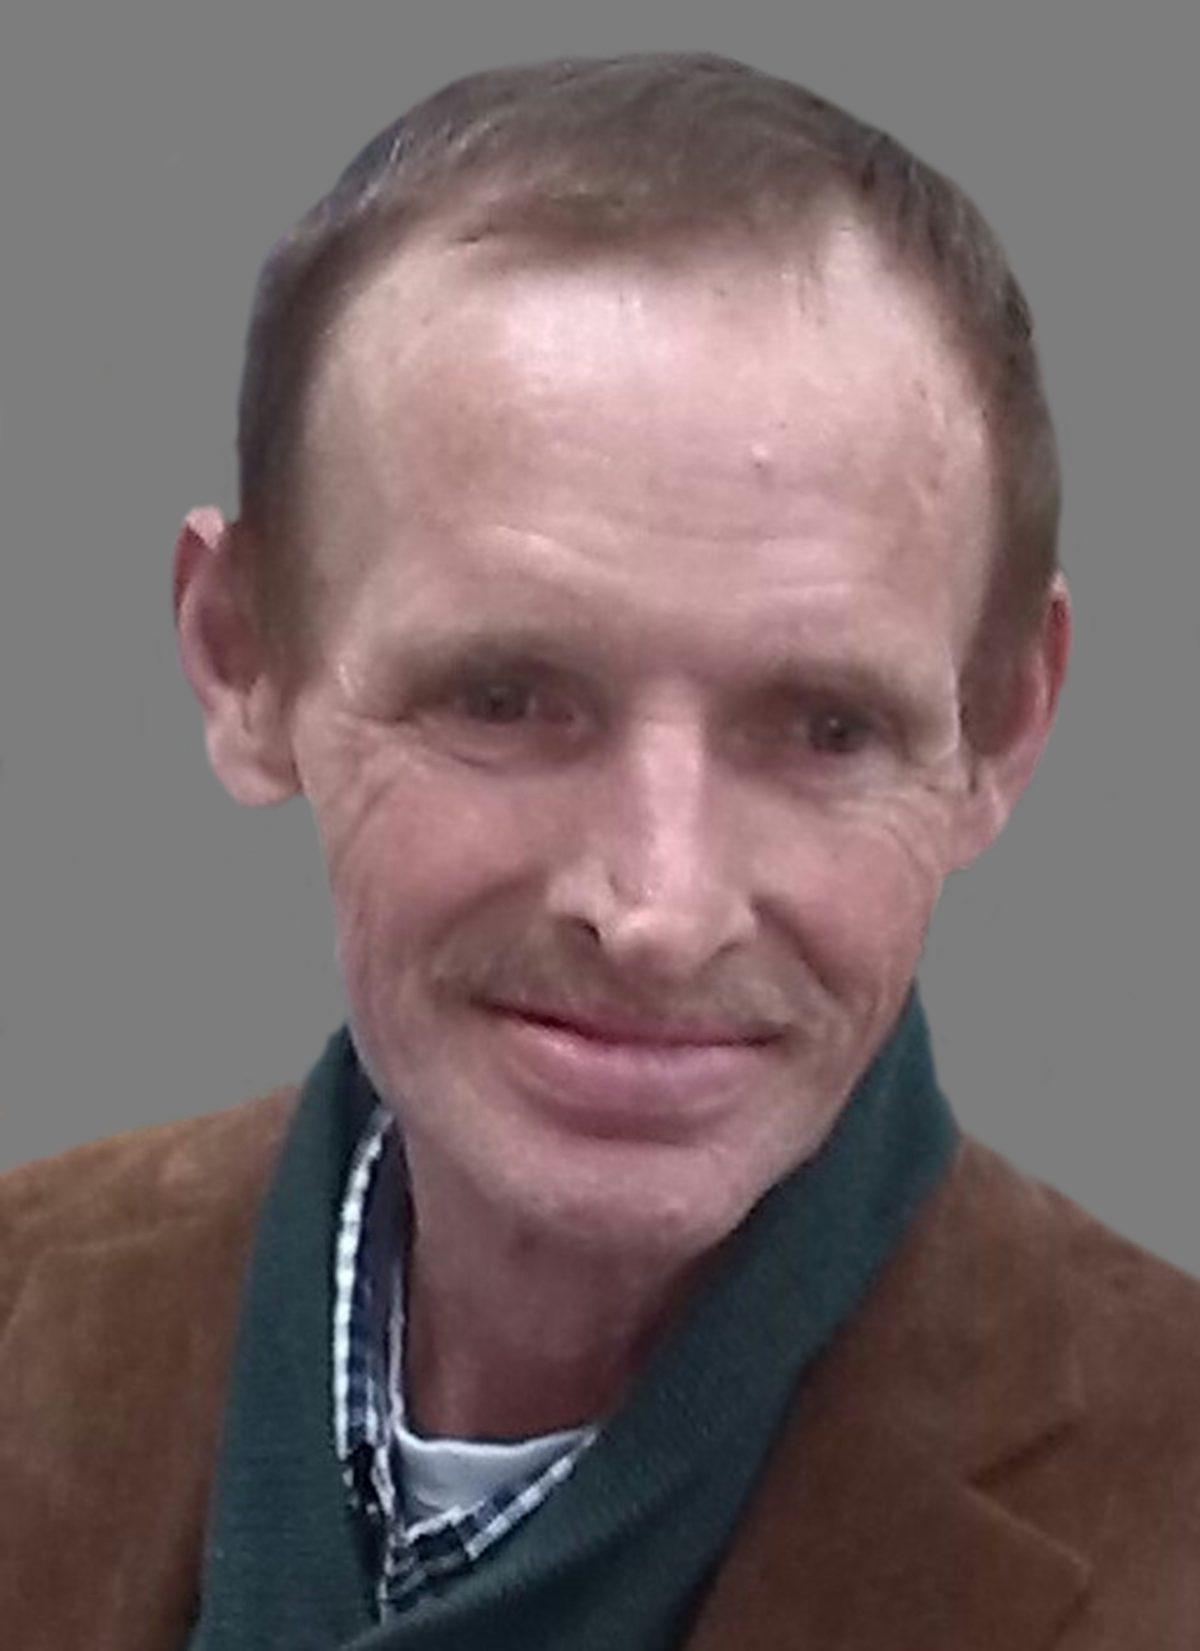 Wim Hendriks